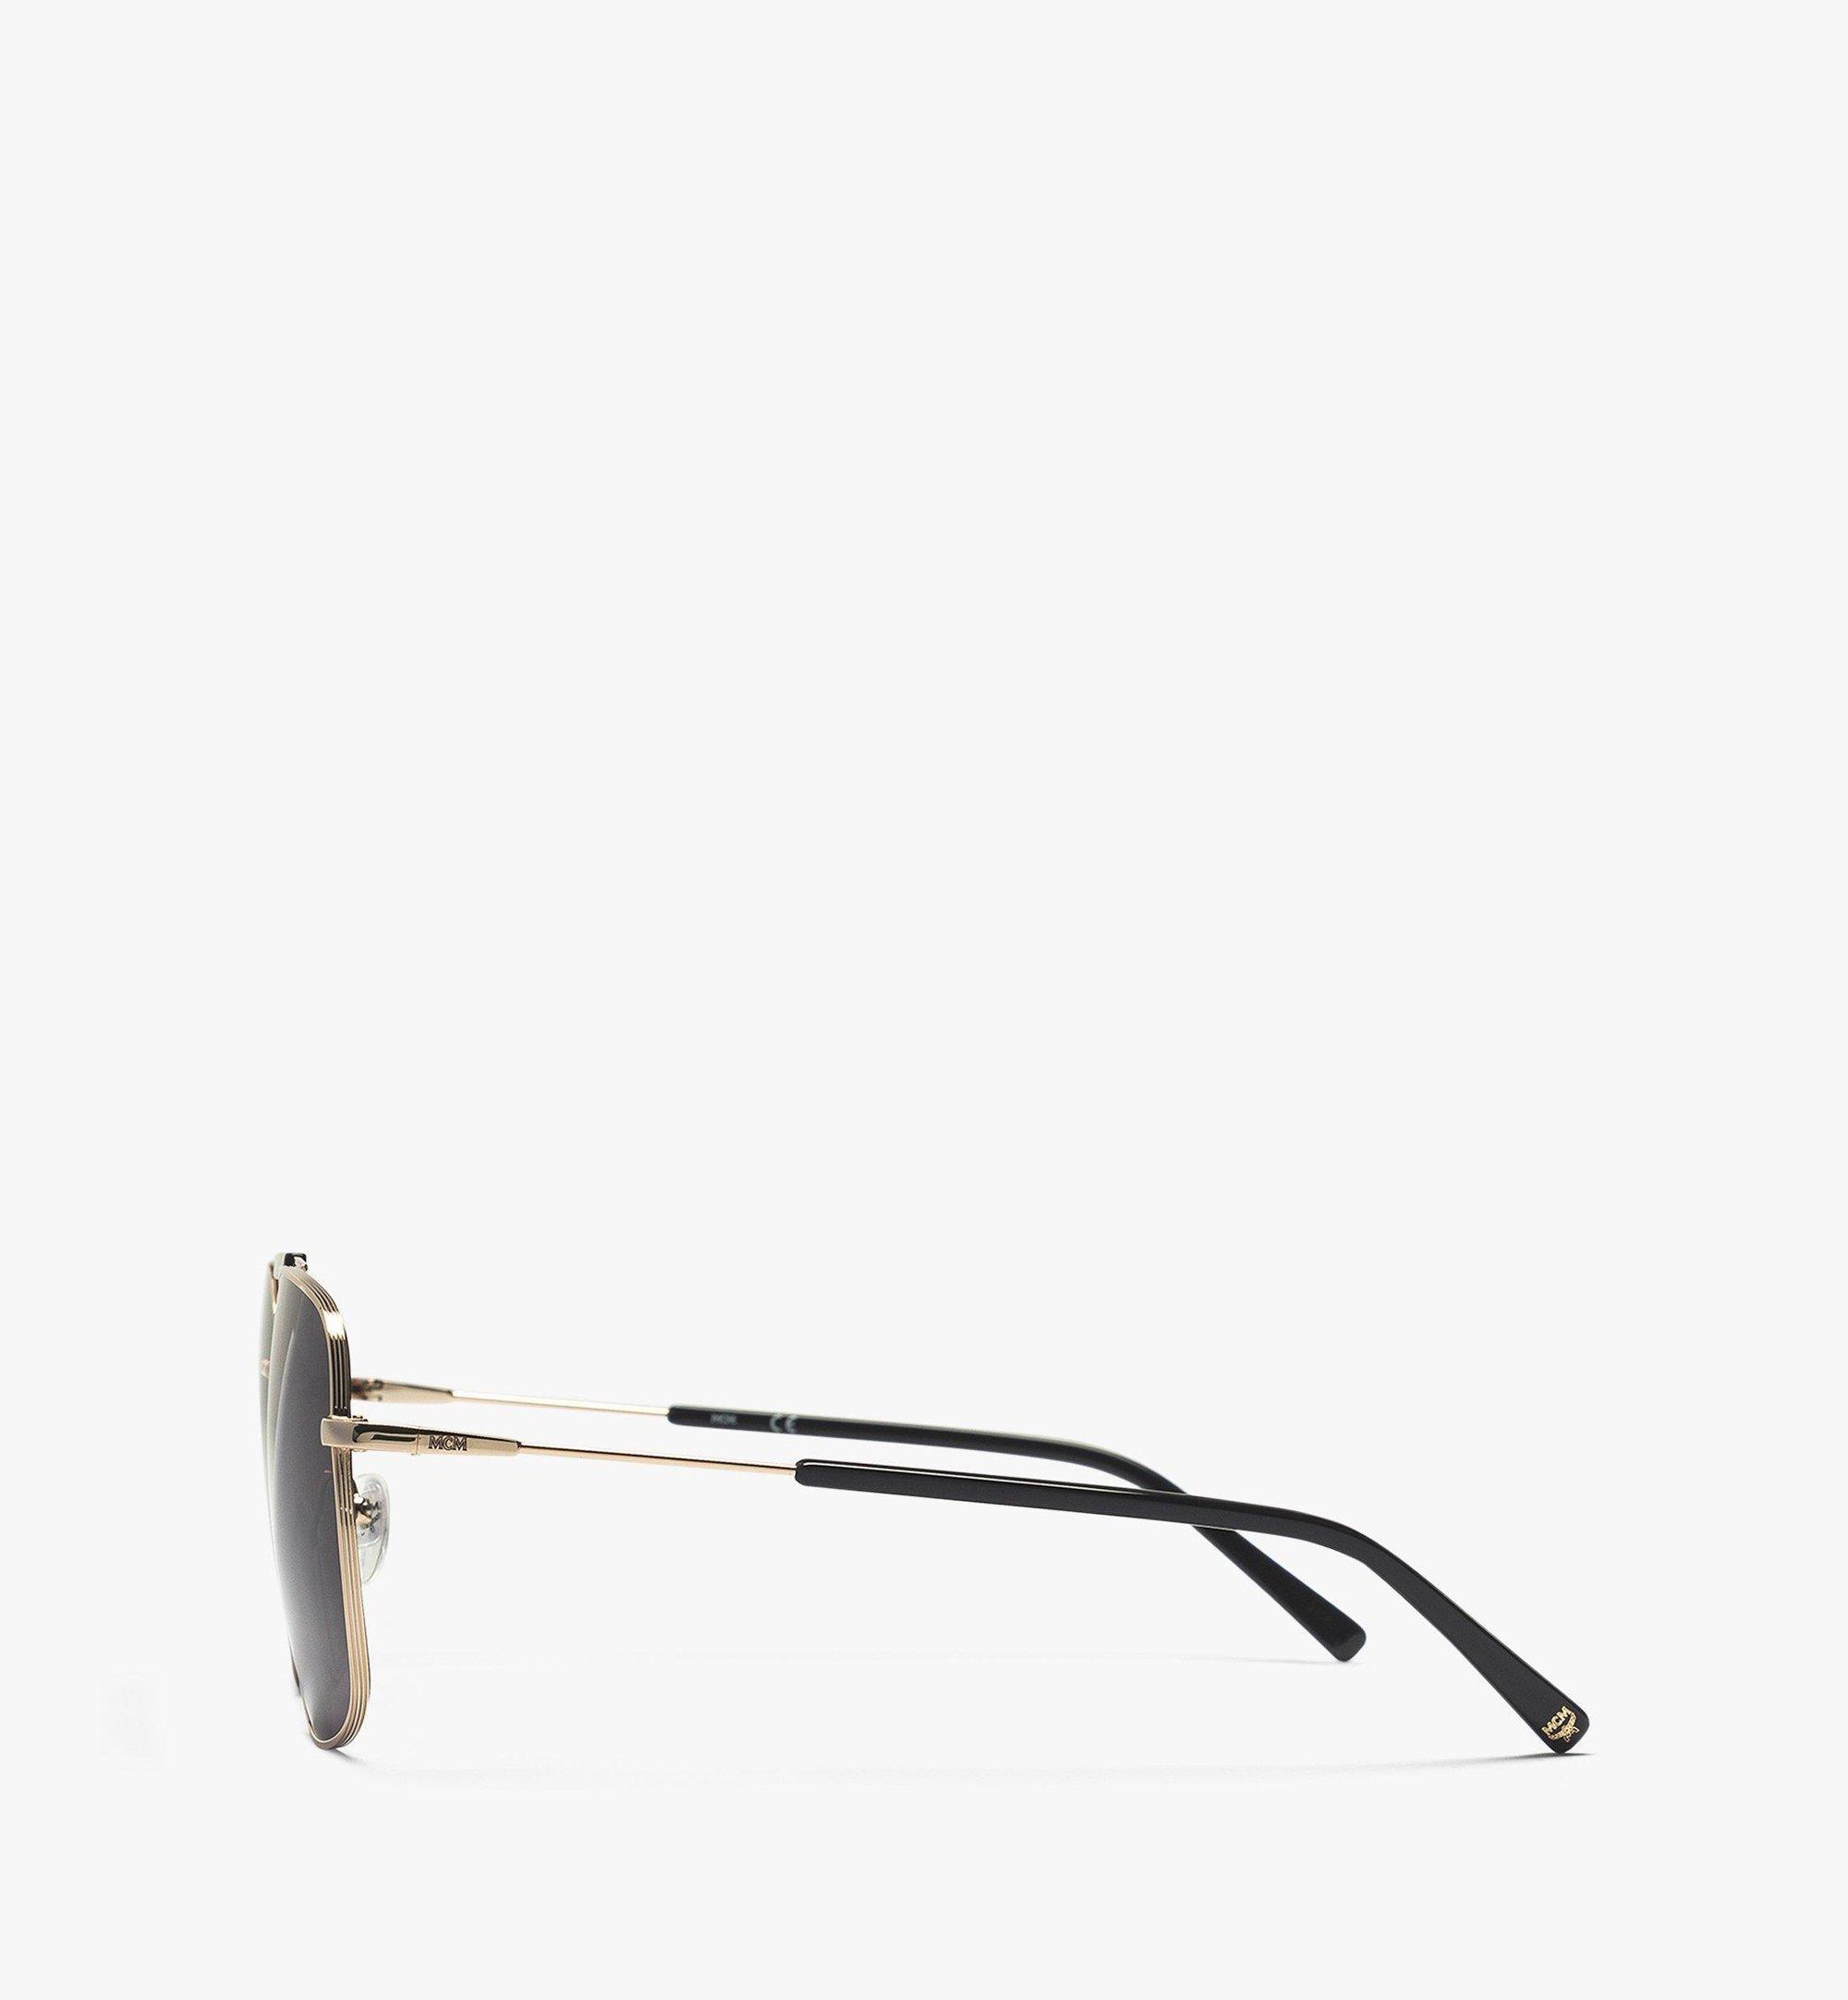 MCM MCM161S Navigator Sunglasses Gold MEGBAMM01DG001 Alternate View 1